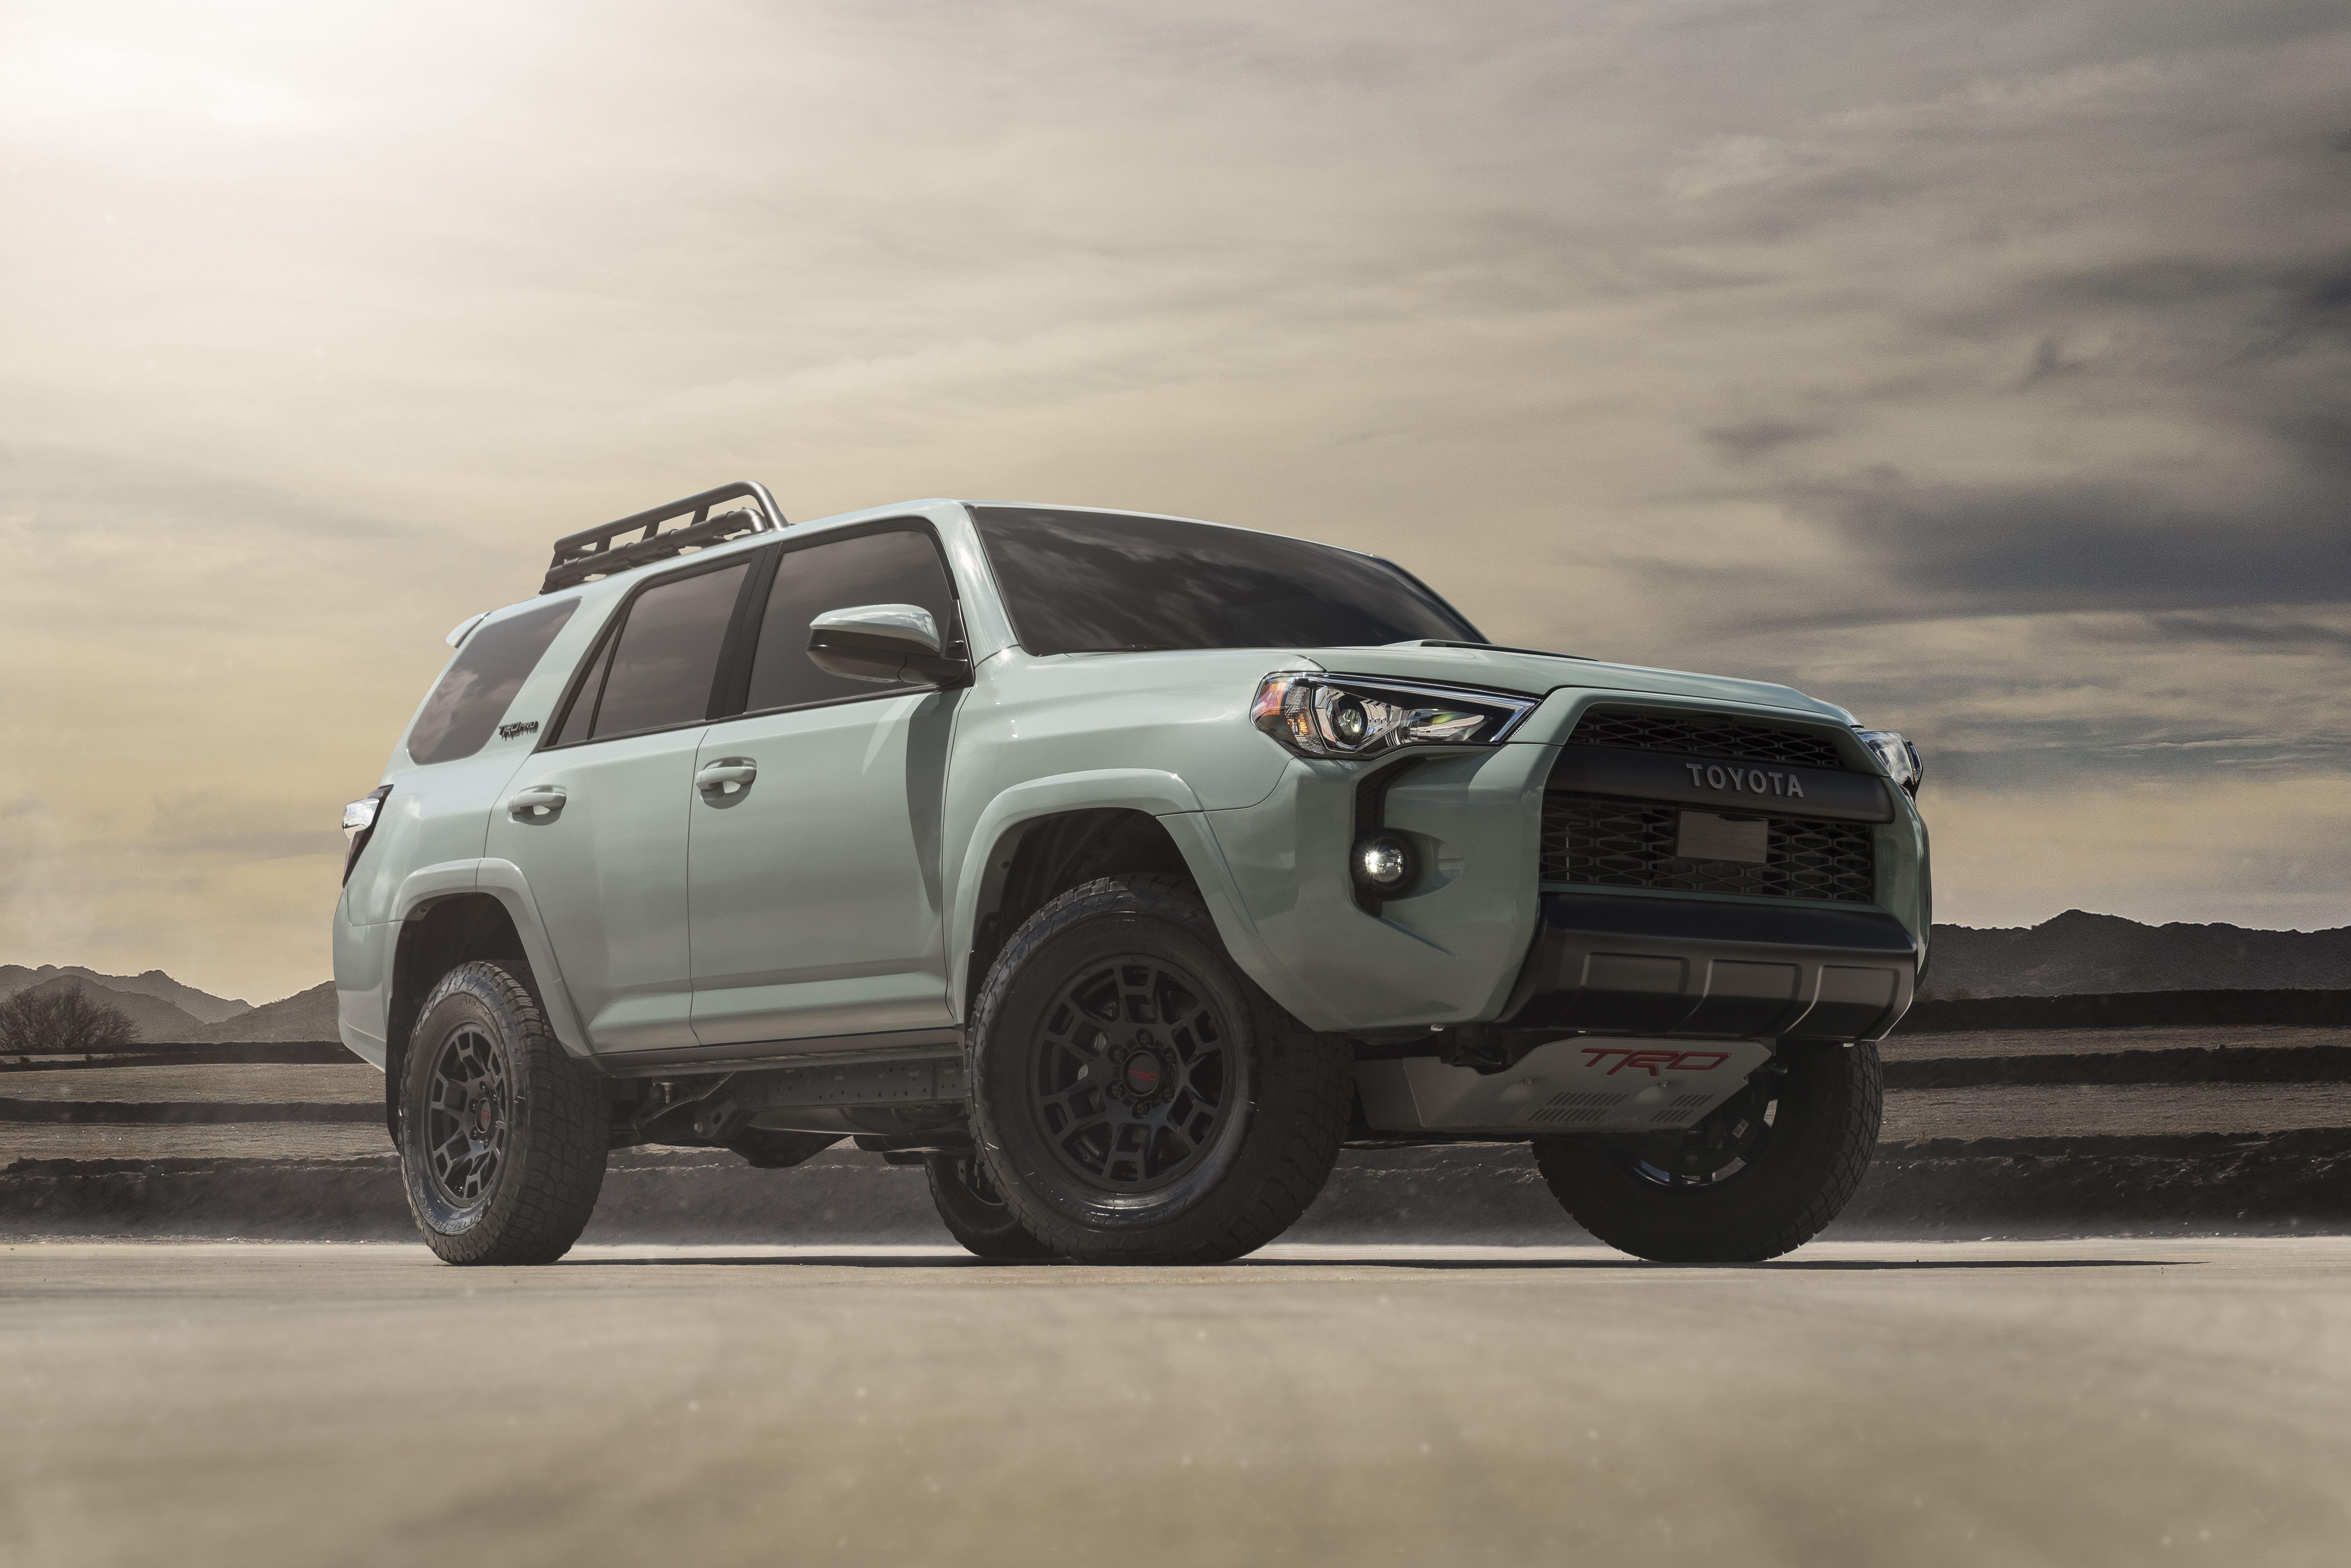 2021 Toyota 4runner Trd Pro Gets New Color Wheels Fox Shocks